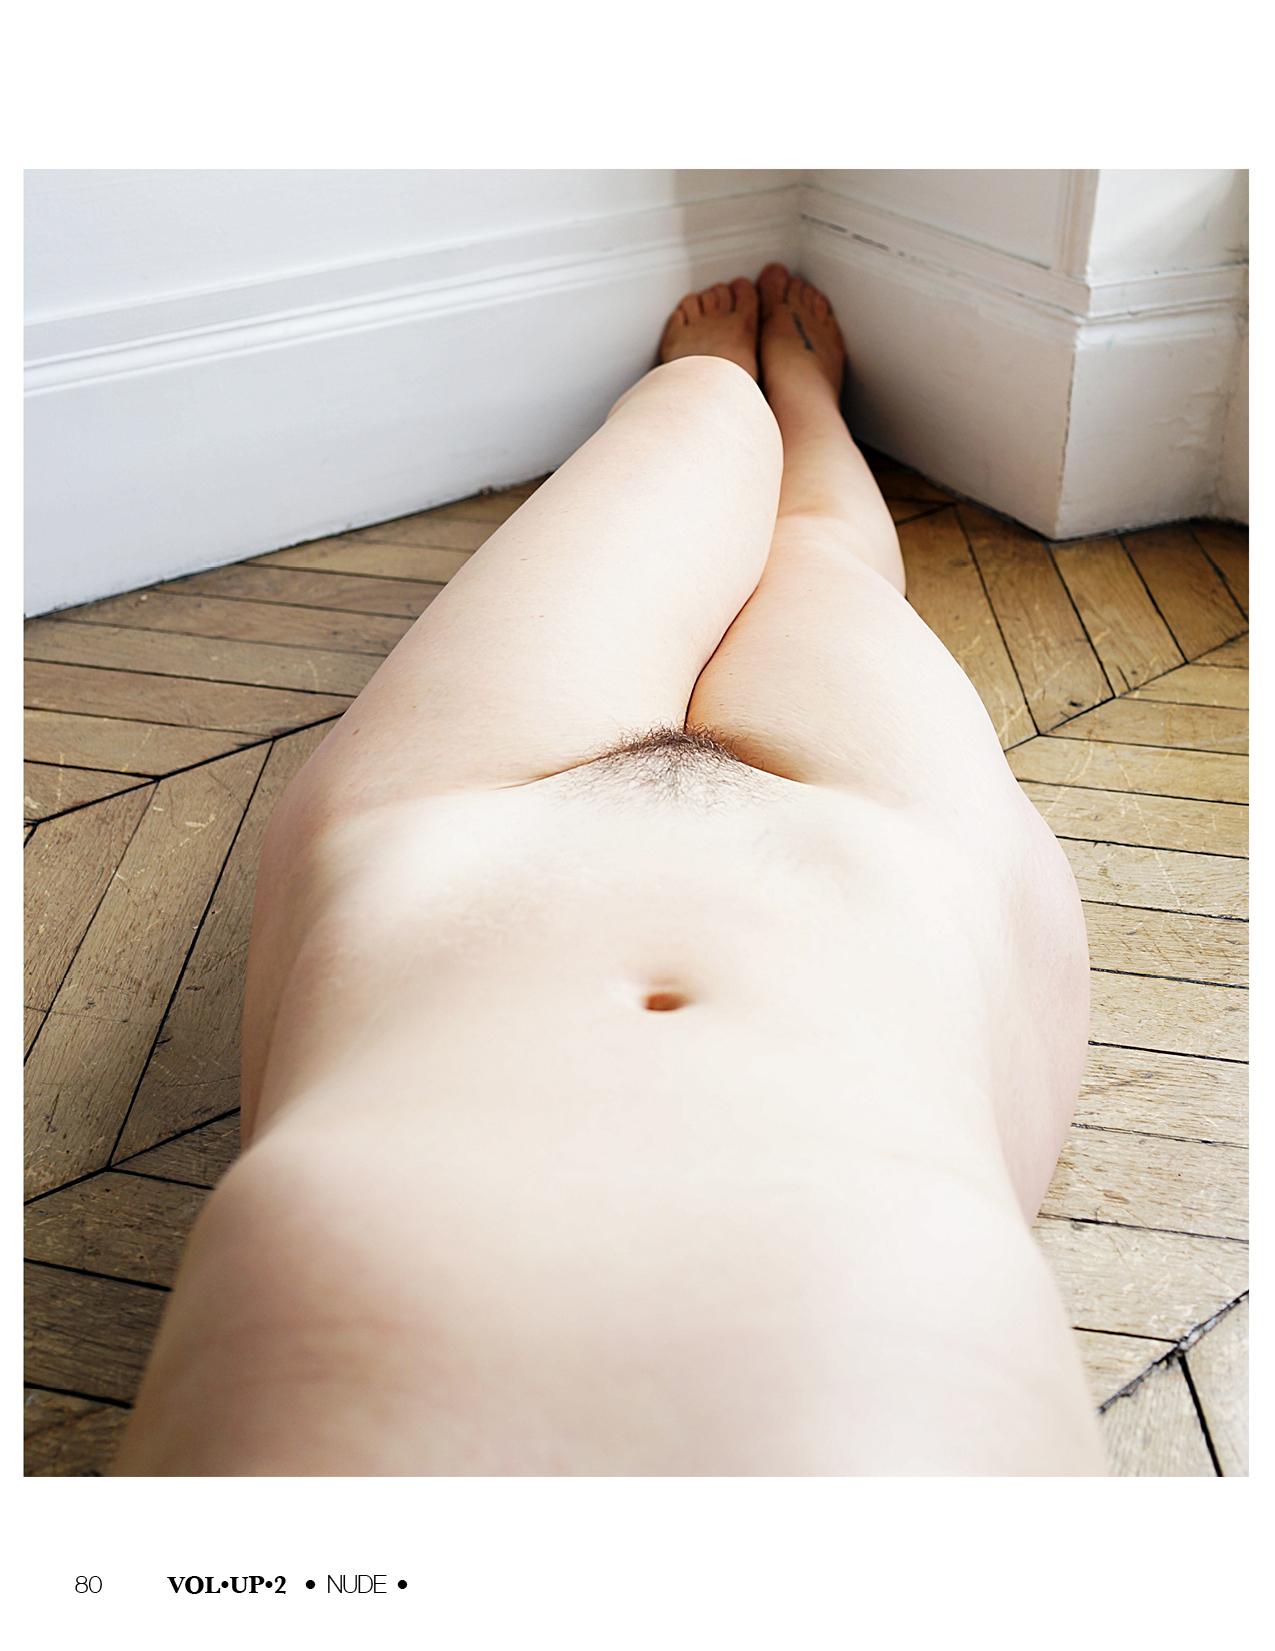 volup2-nude-whole-FINAL80.jpg